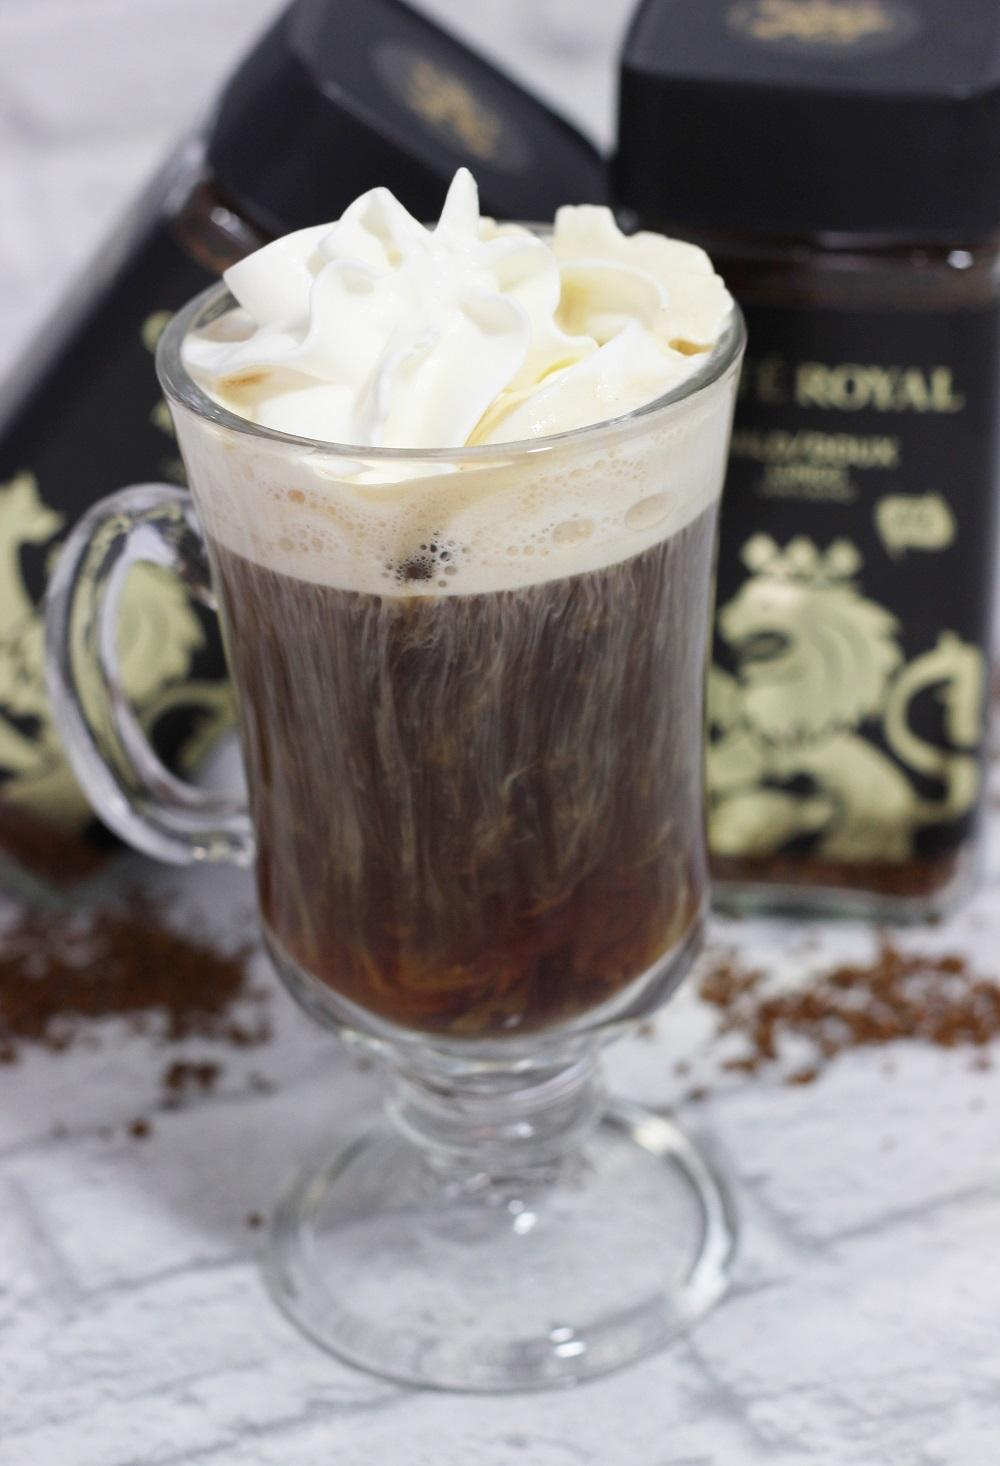 Eiskaffee aus Instantkaffee